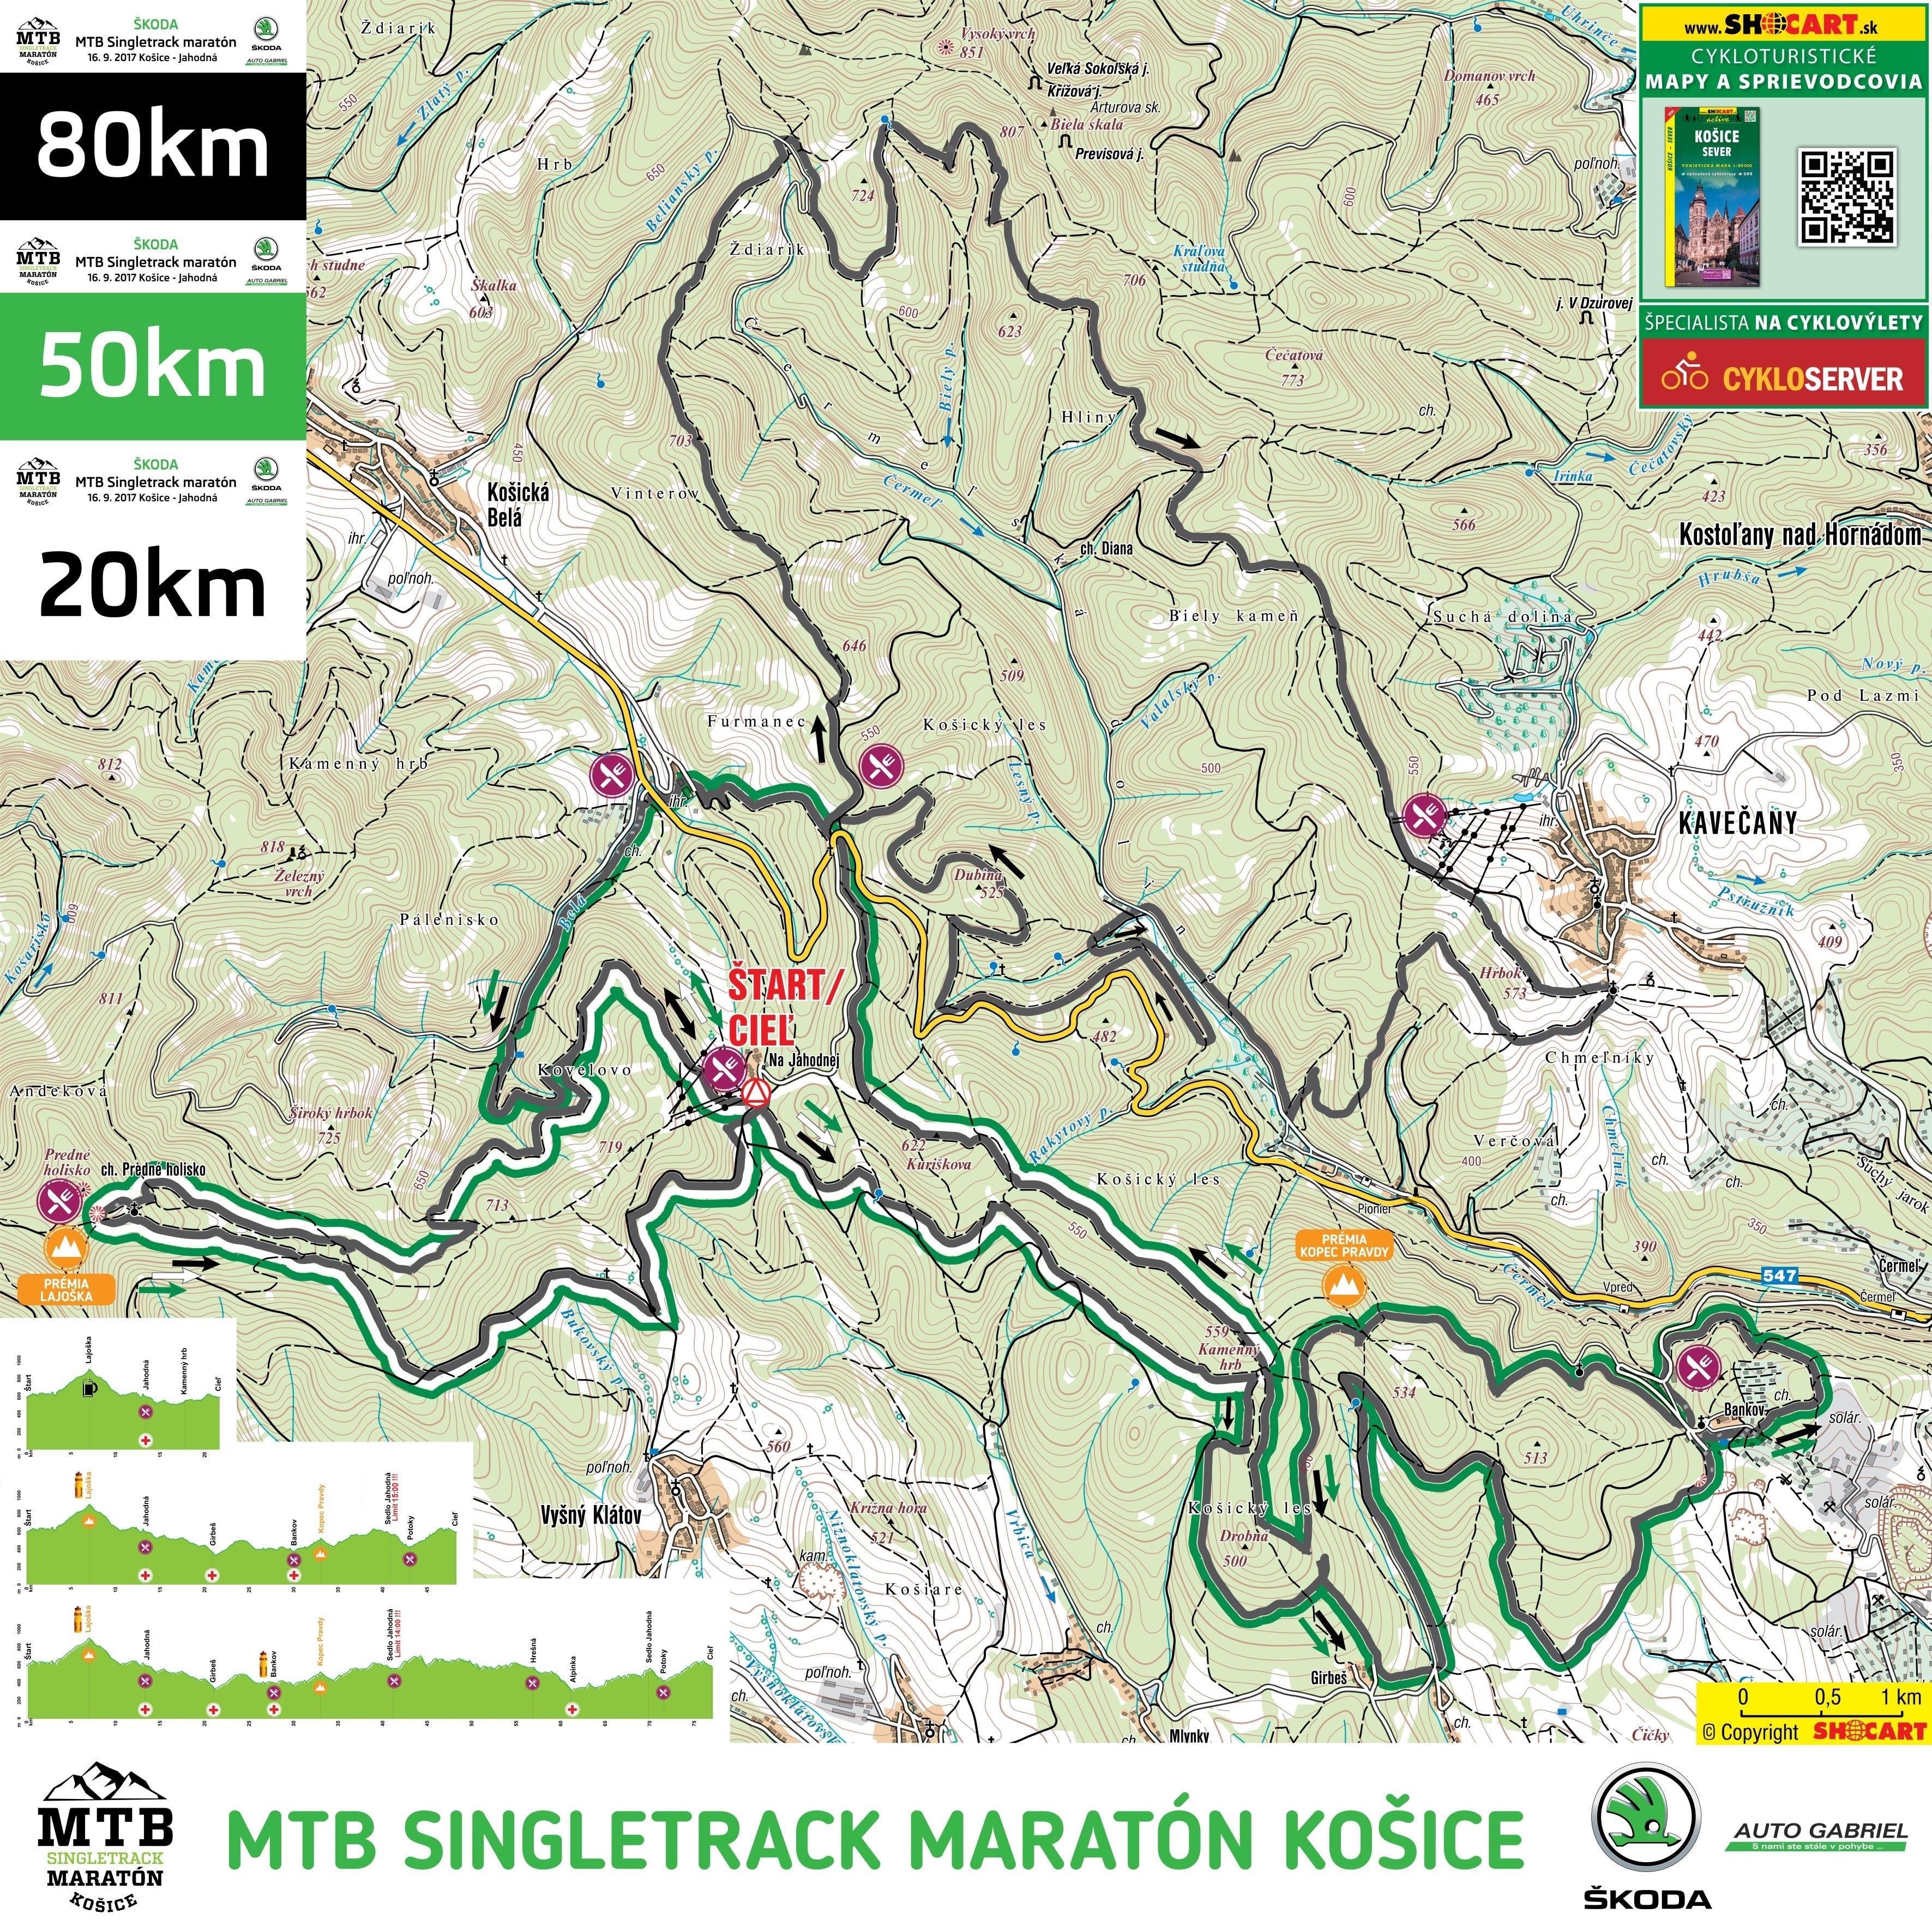 mapa mtb singletrack maraton kosice